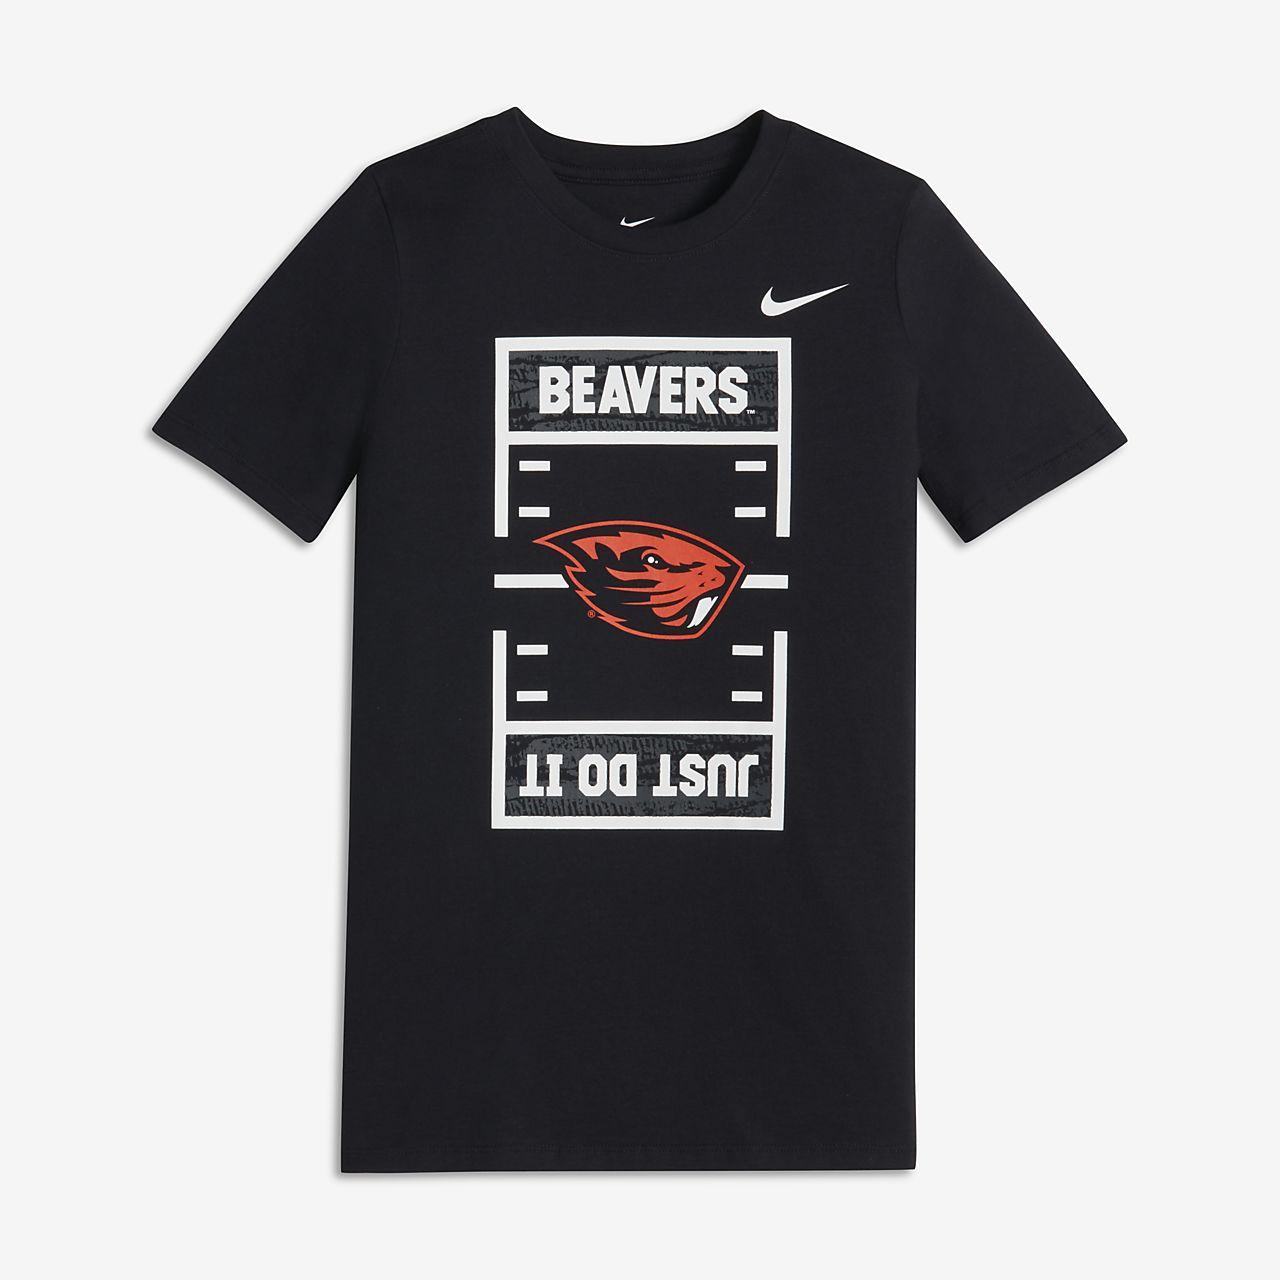 Nike college just do it oregon state big kids football t shirt nike college just do it oregon state big kids football t shirt voltagebd Images